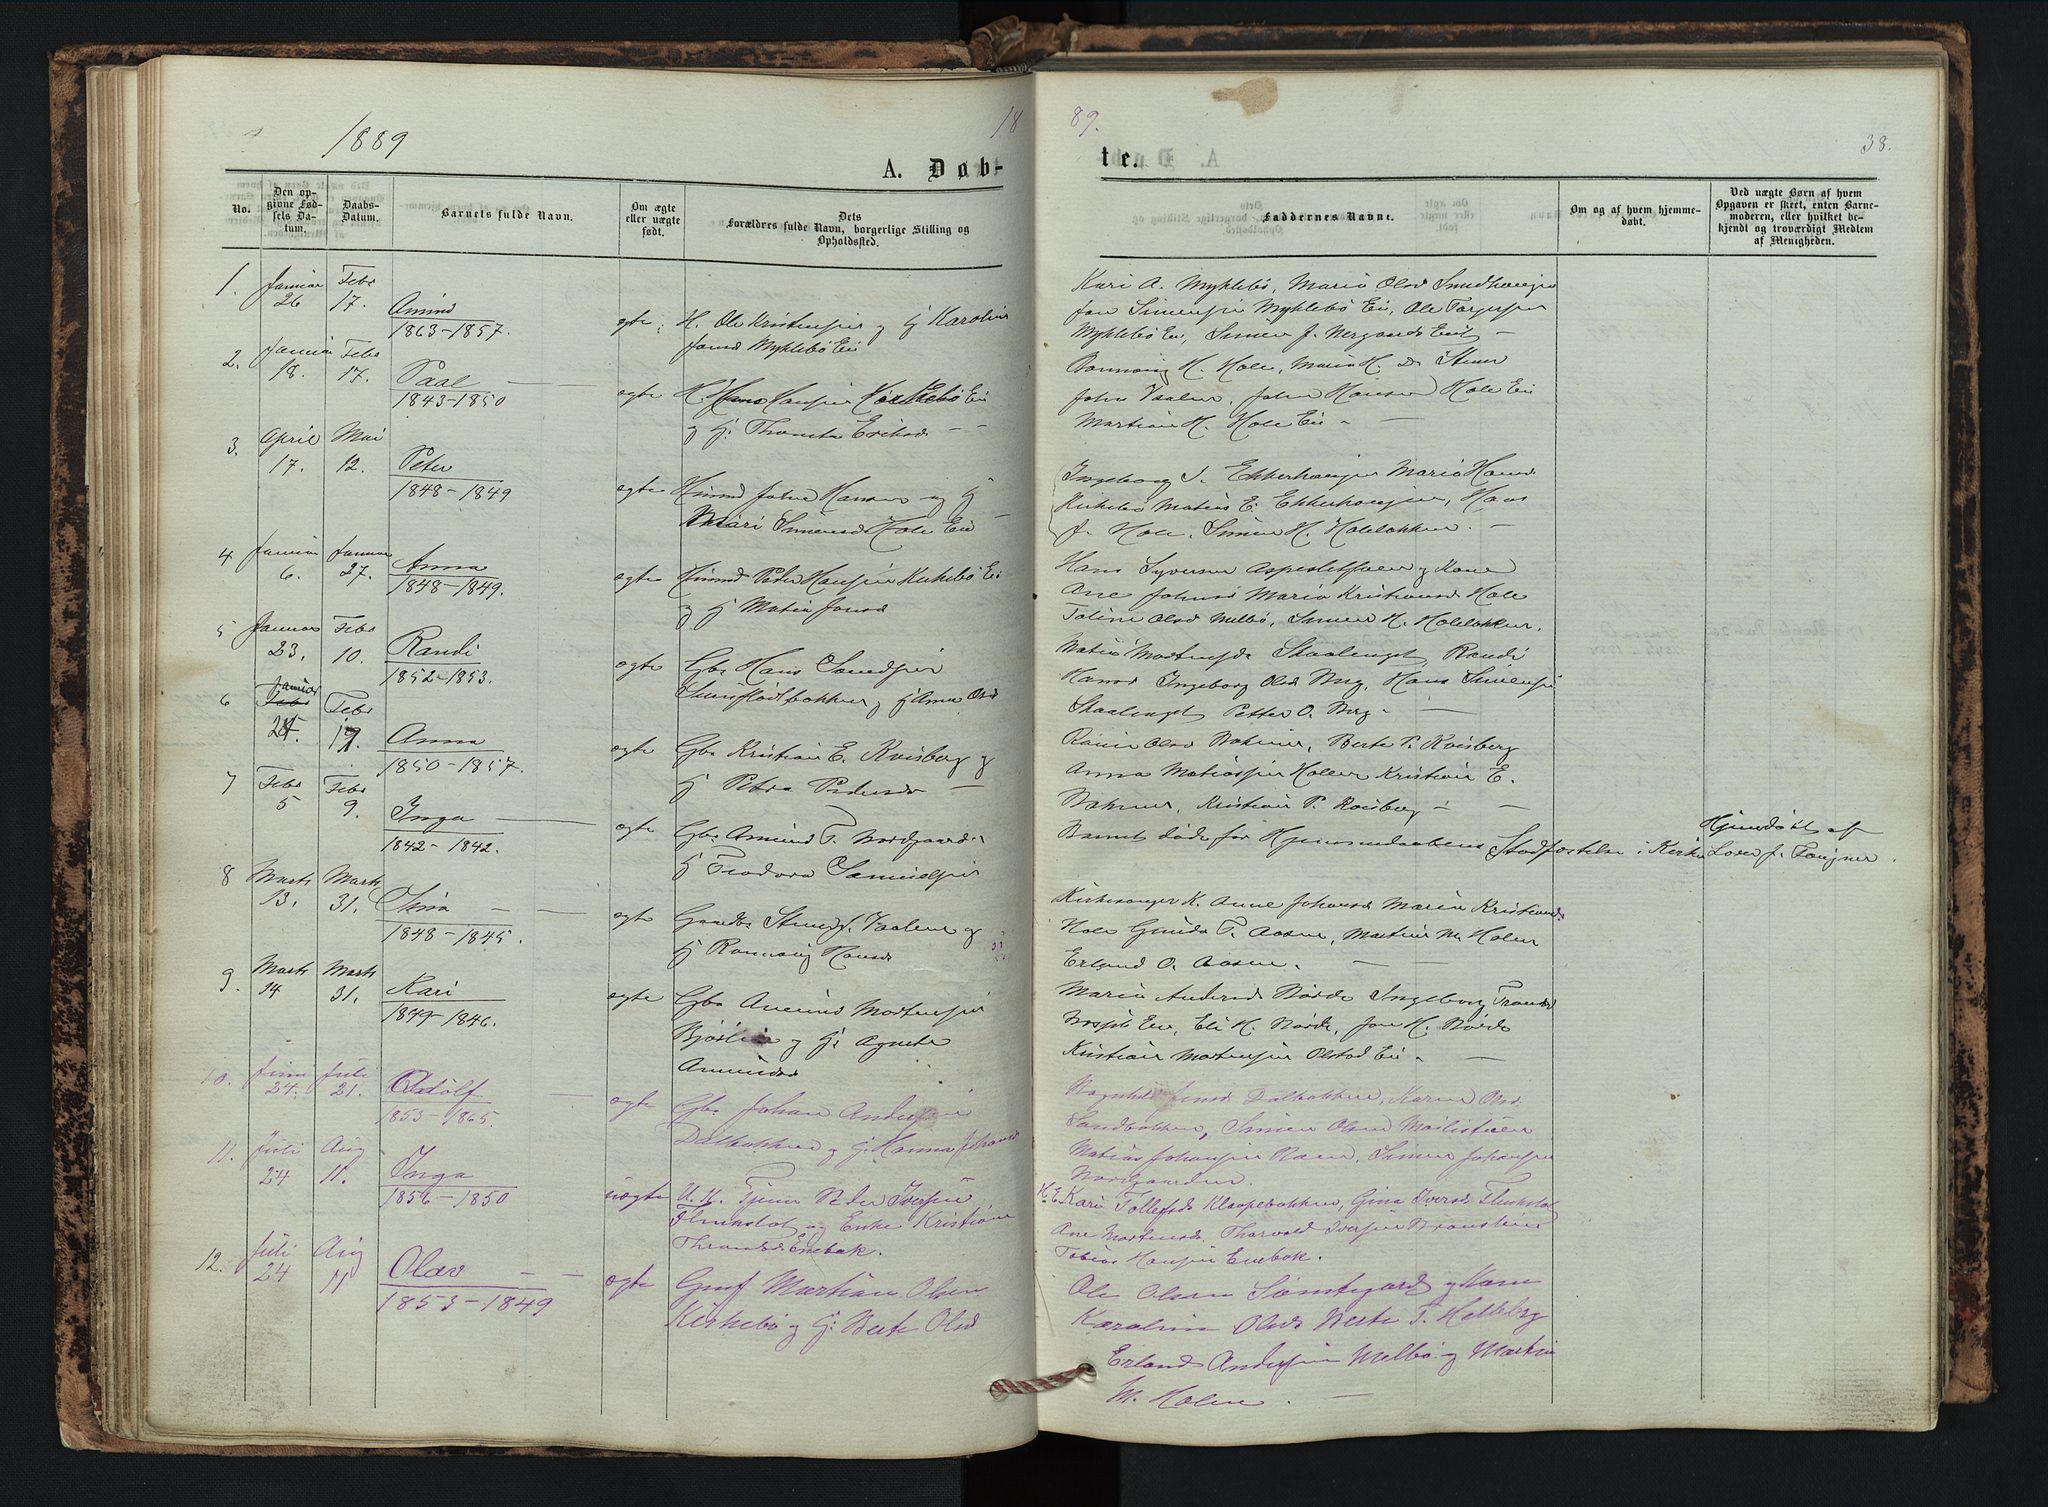 SAH, Vestre Gausdal prestekontor, Klokkerbok nr. 2, 1874-1897, s. 38